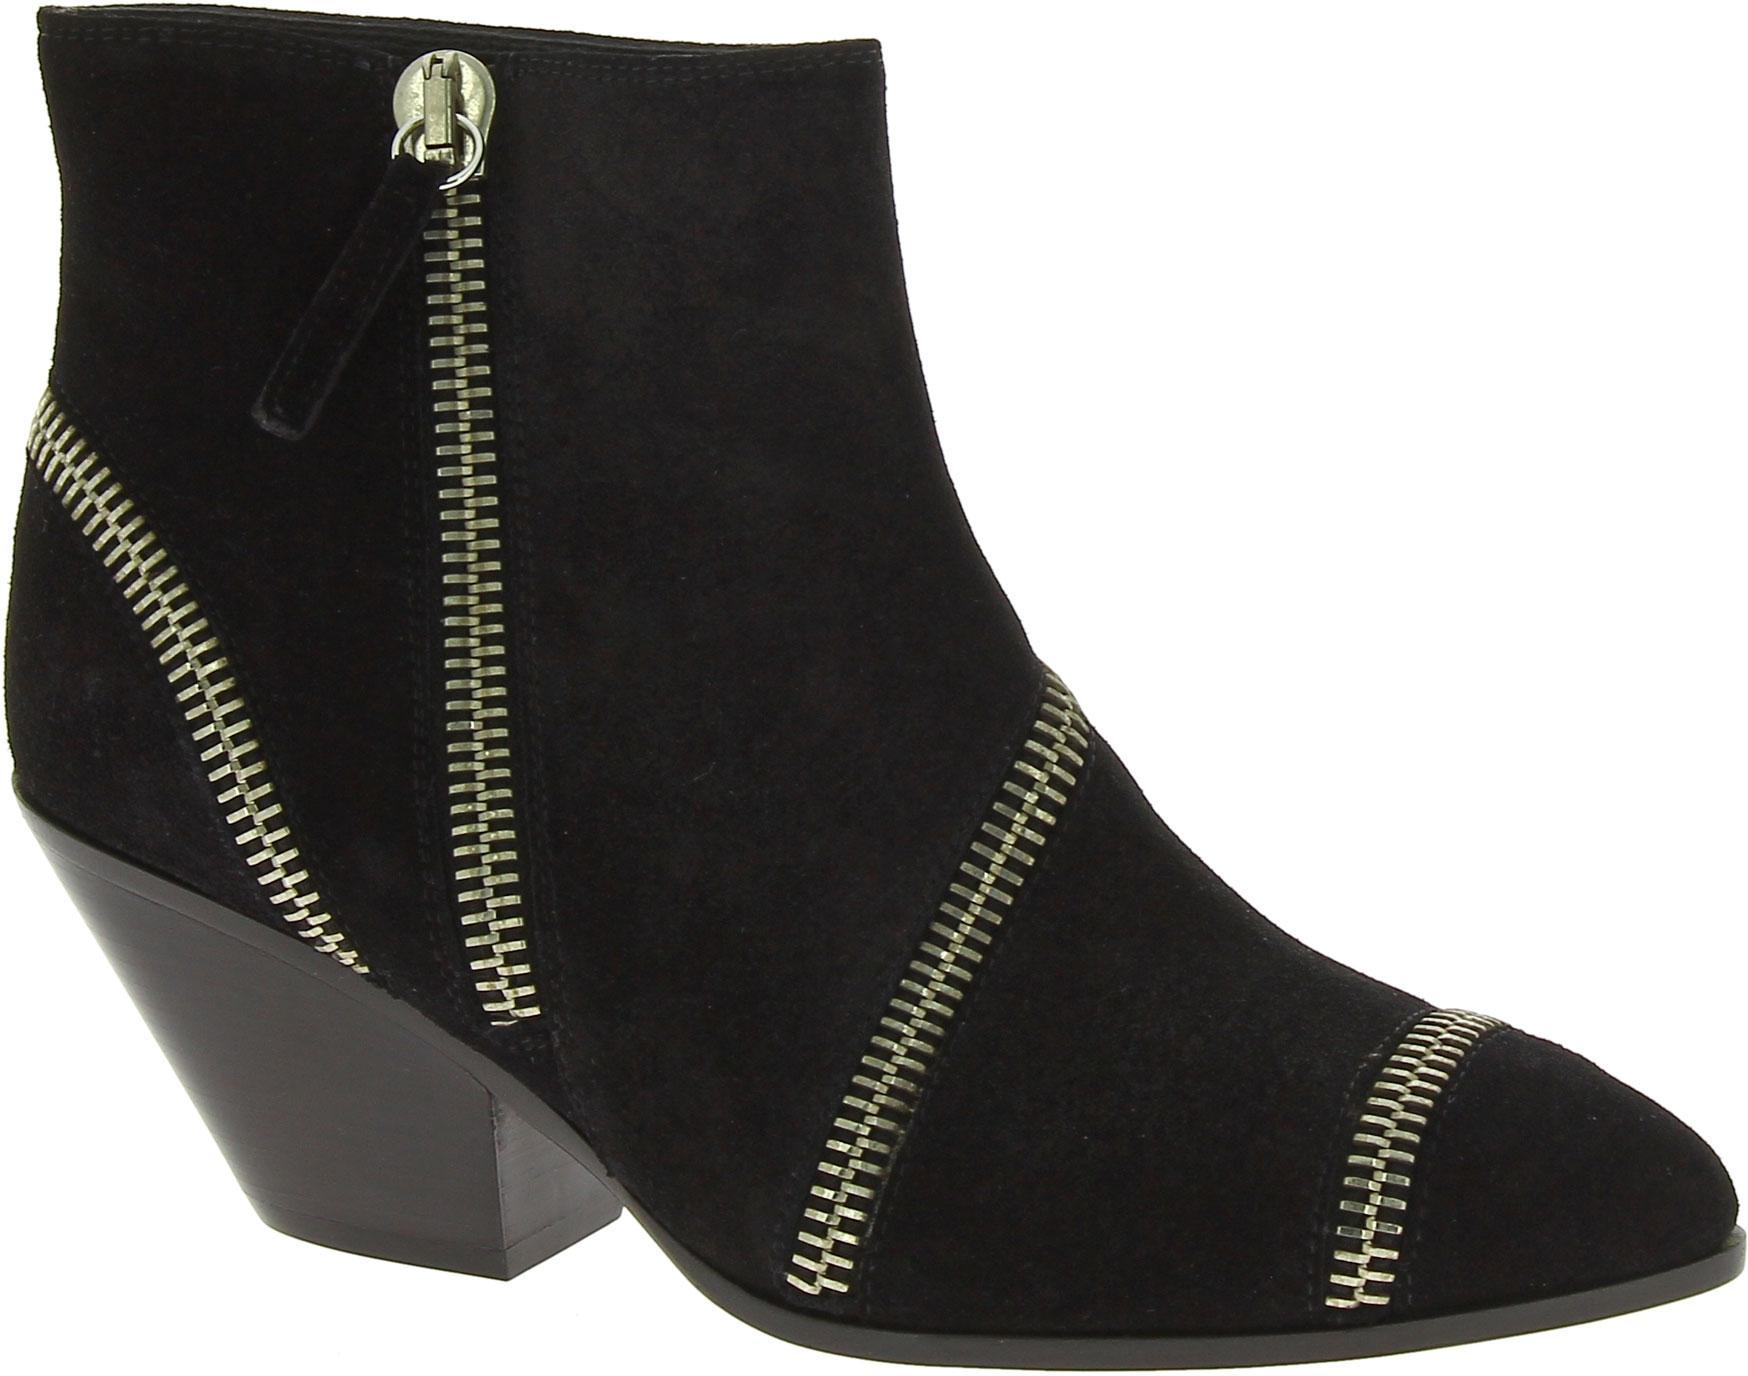 b4a2ccba5e32c Giuseppe Zanotti Women's western heel ankle boots in black suede leather -  Italian Boutique